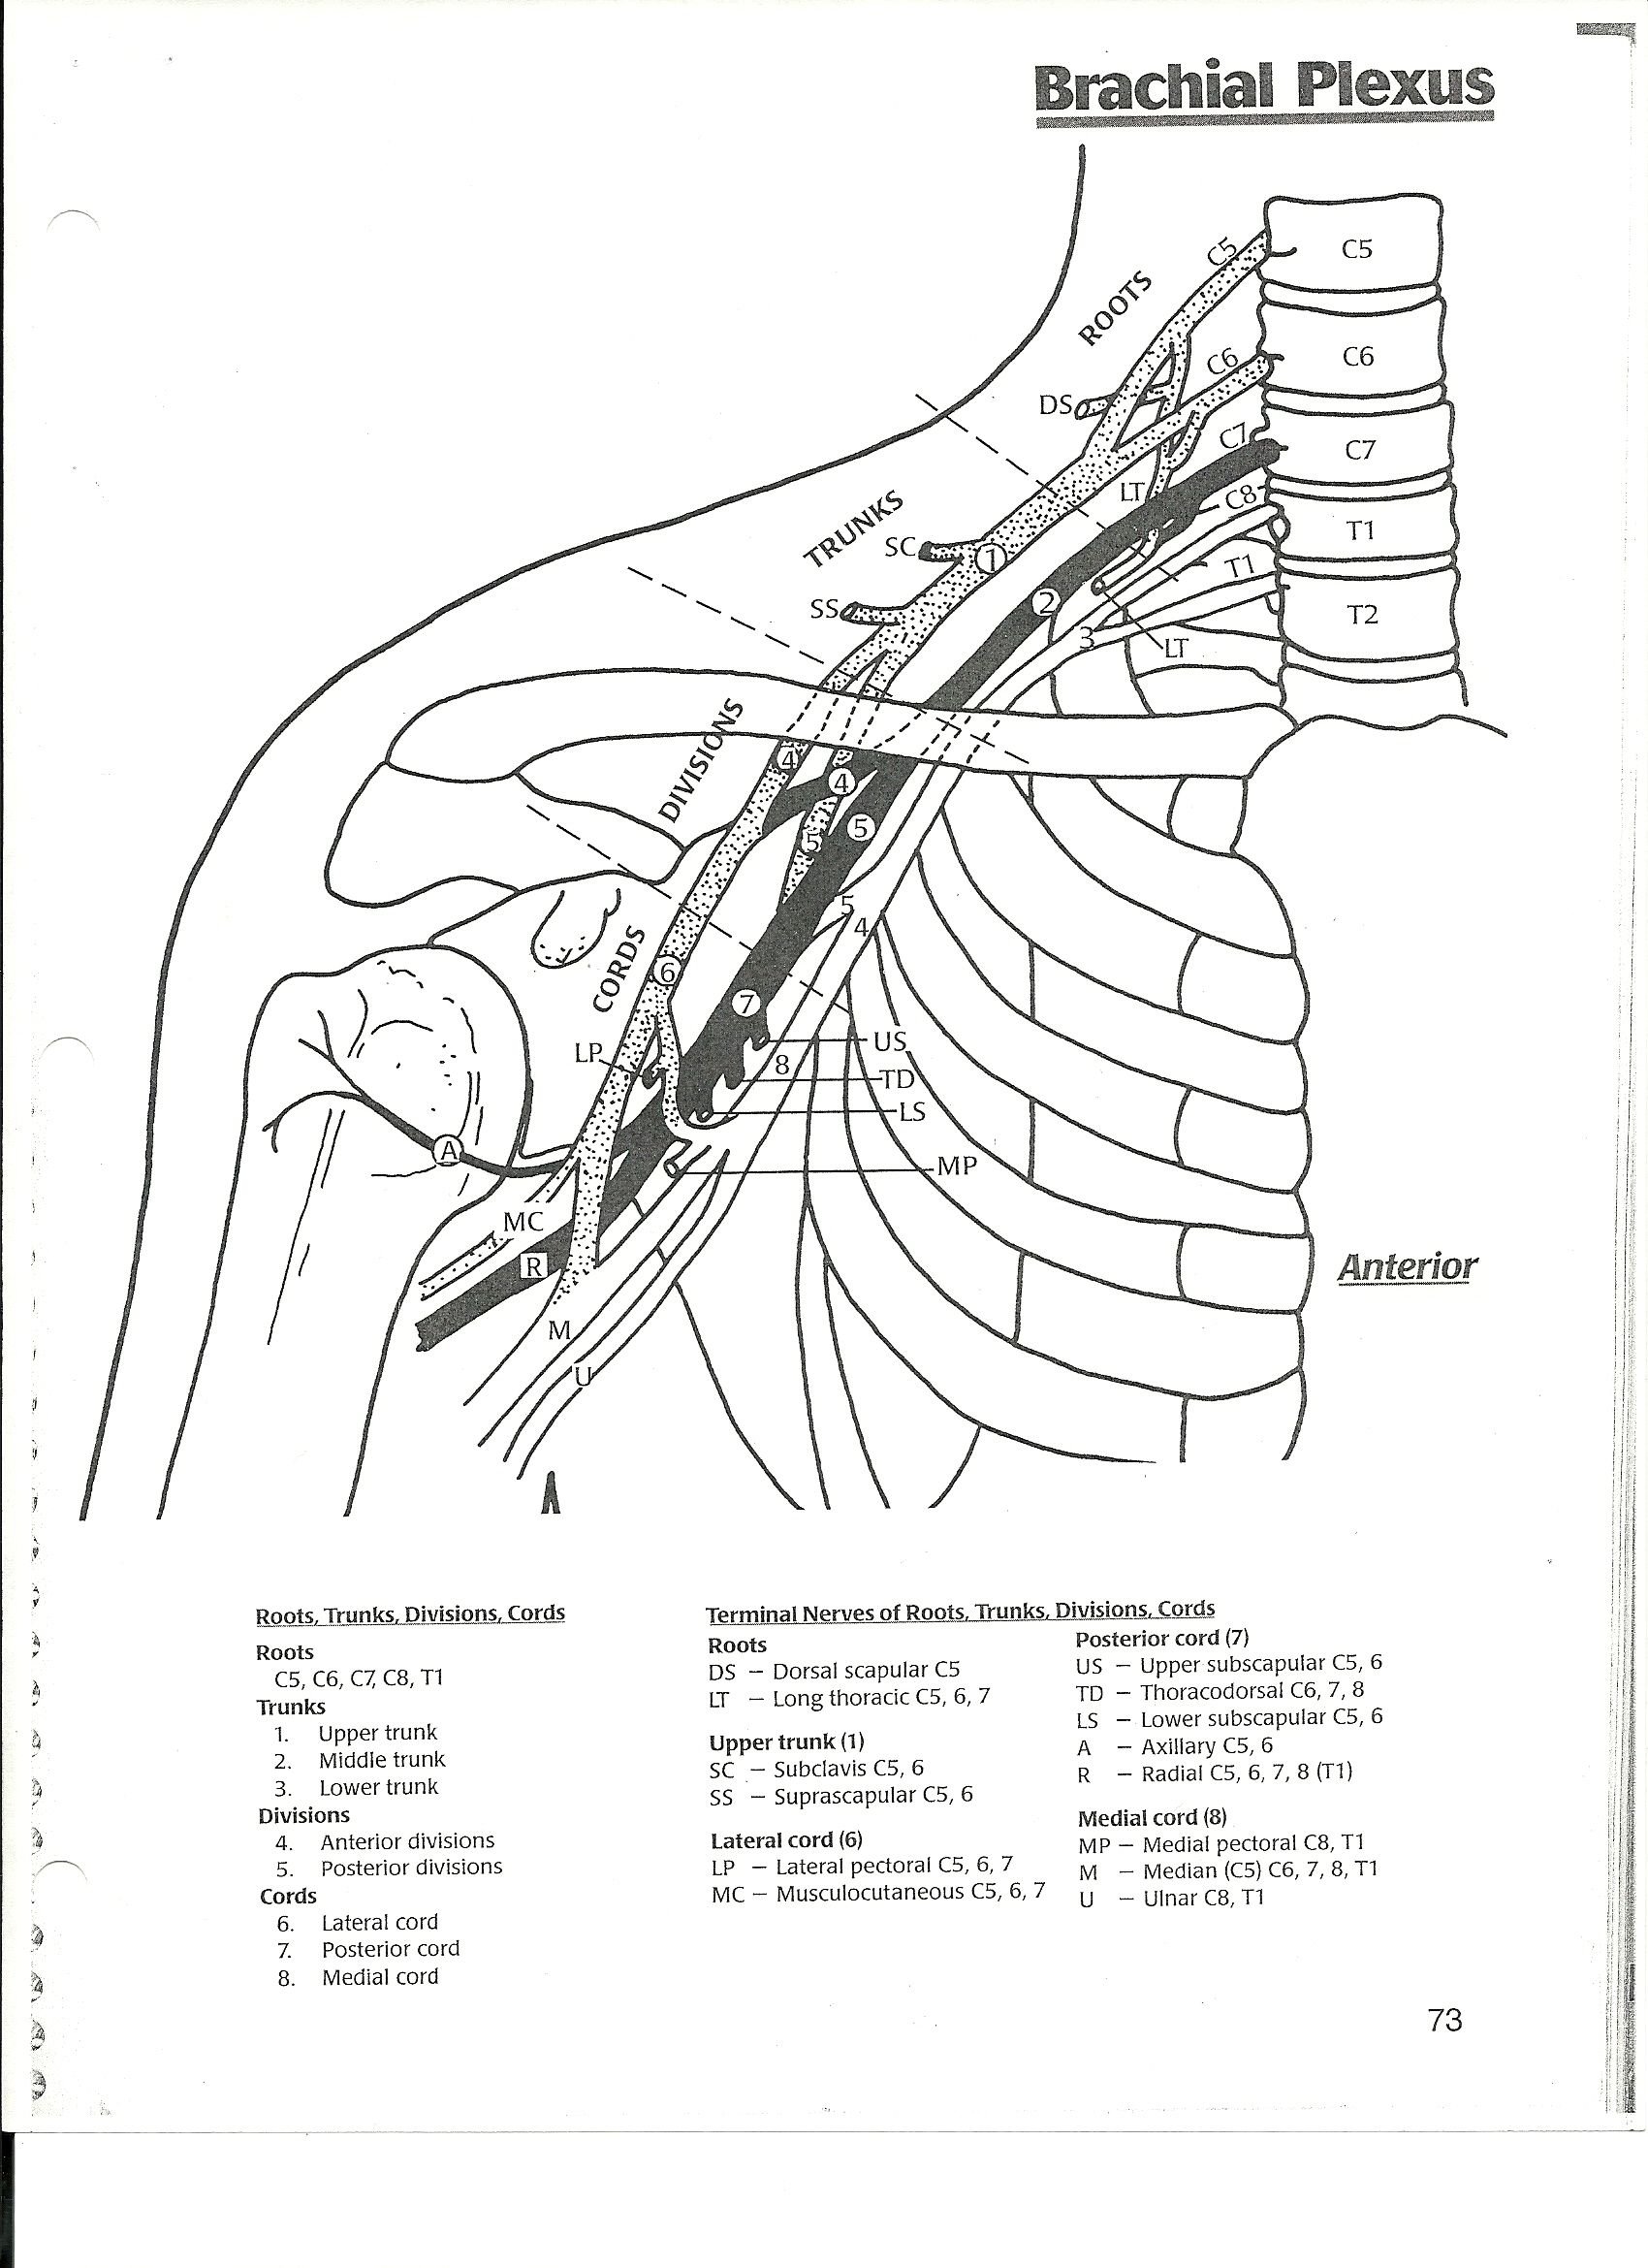 Brachial Plexus With Images